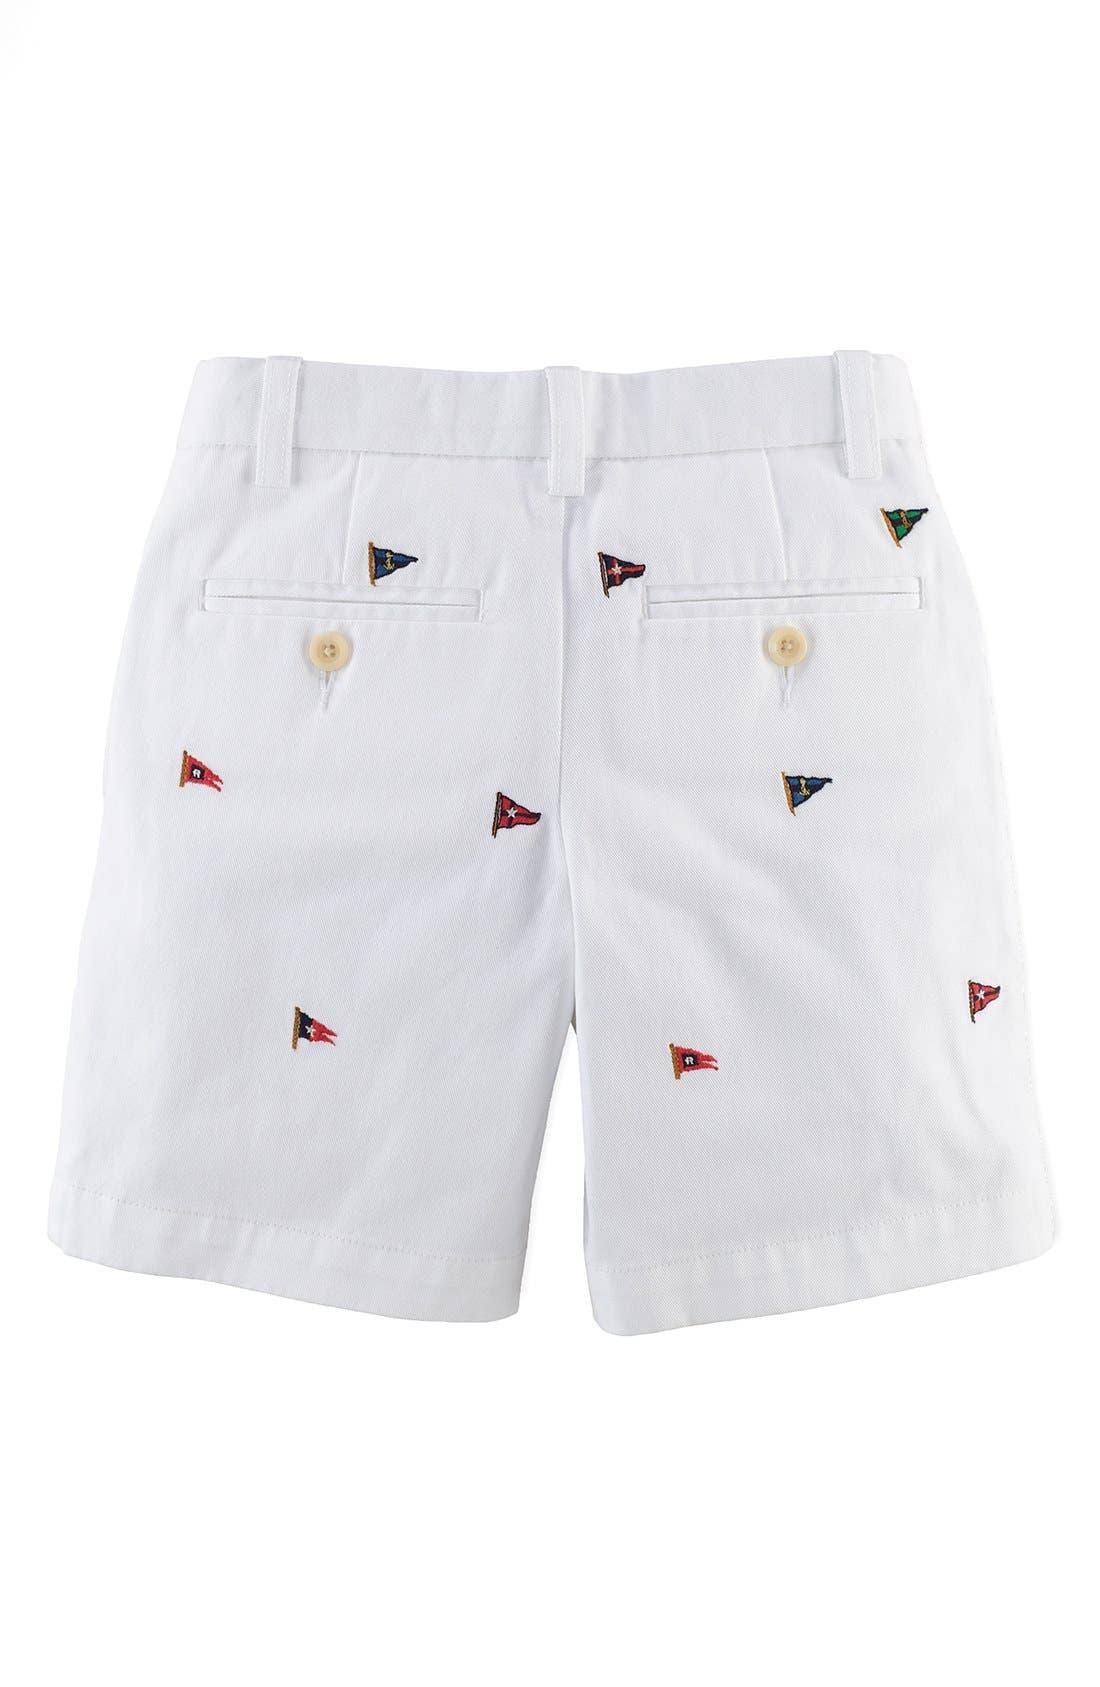 Alternate Image 2  - Ralph Lauren Chino Shorts (Toddler Boys)